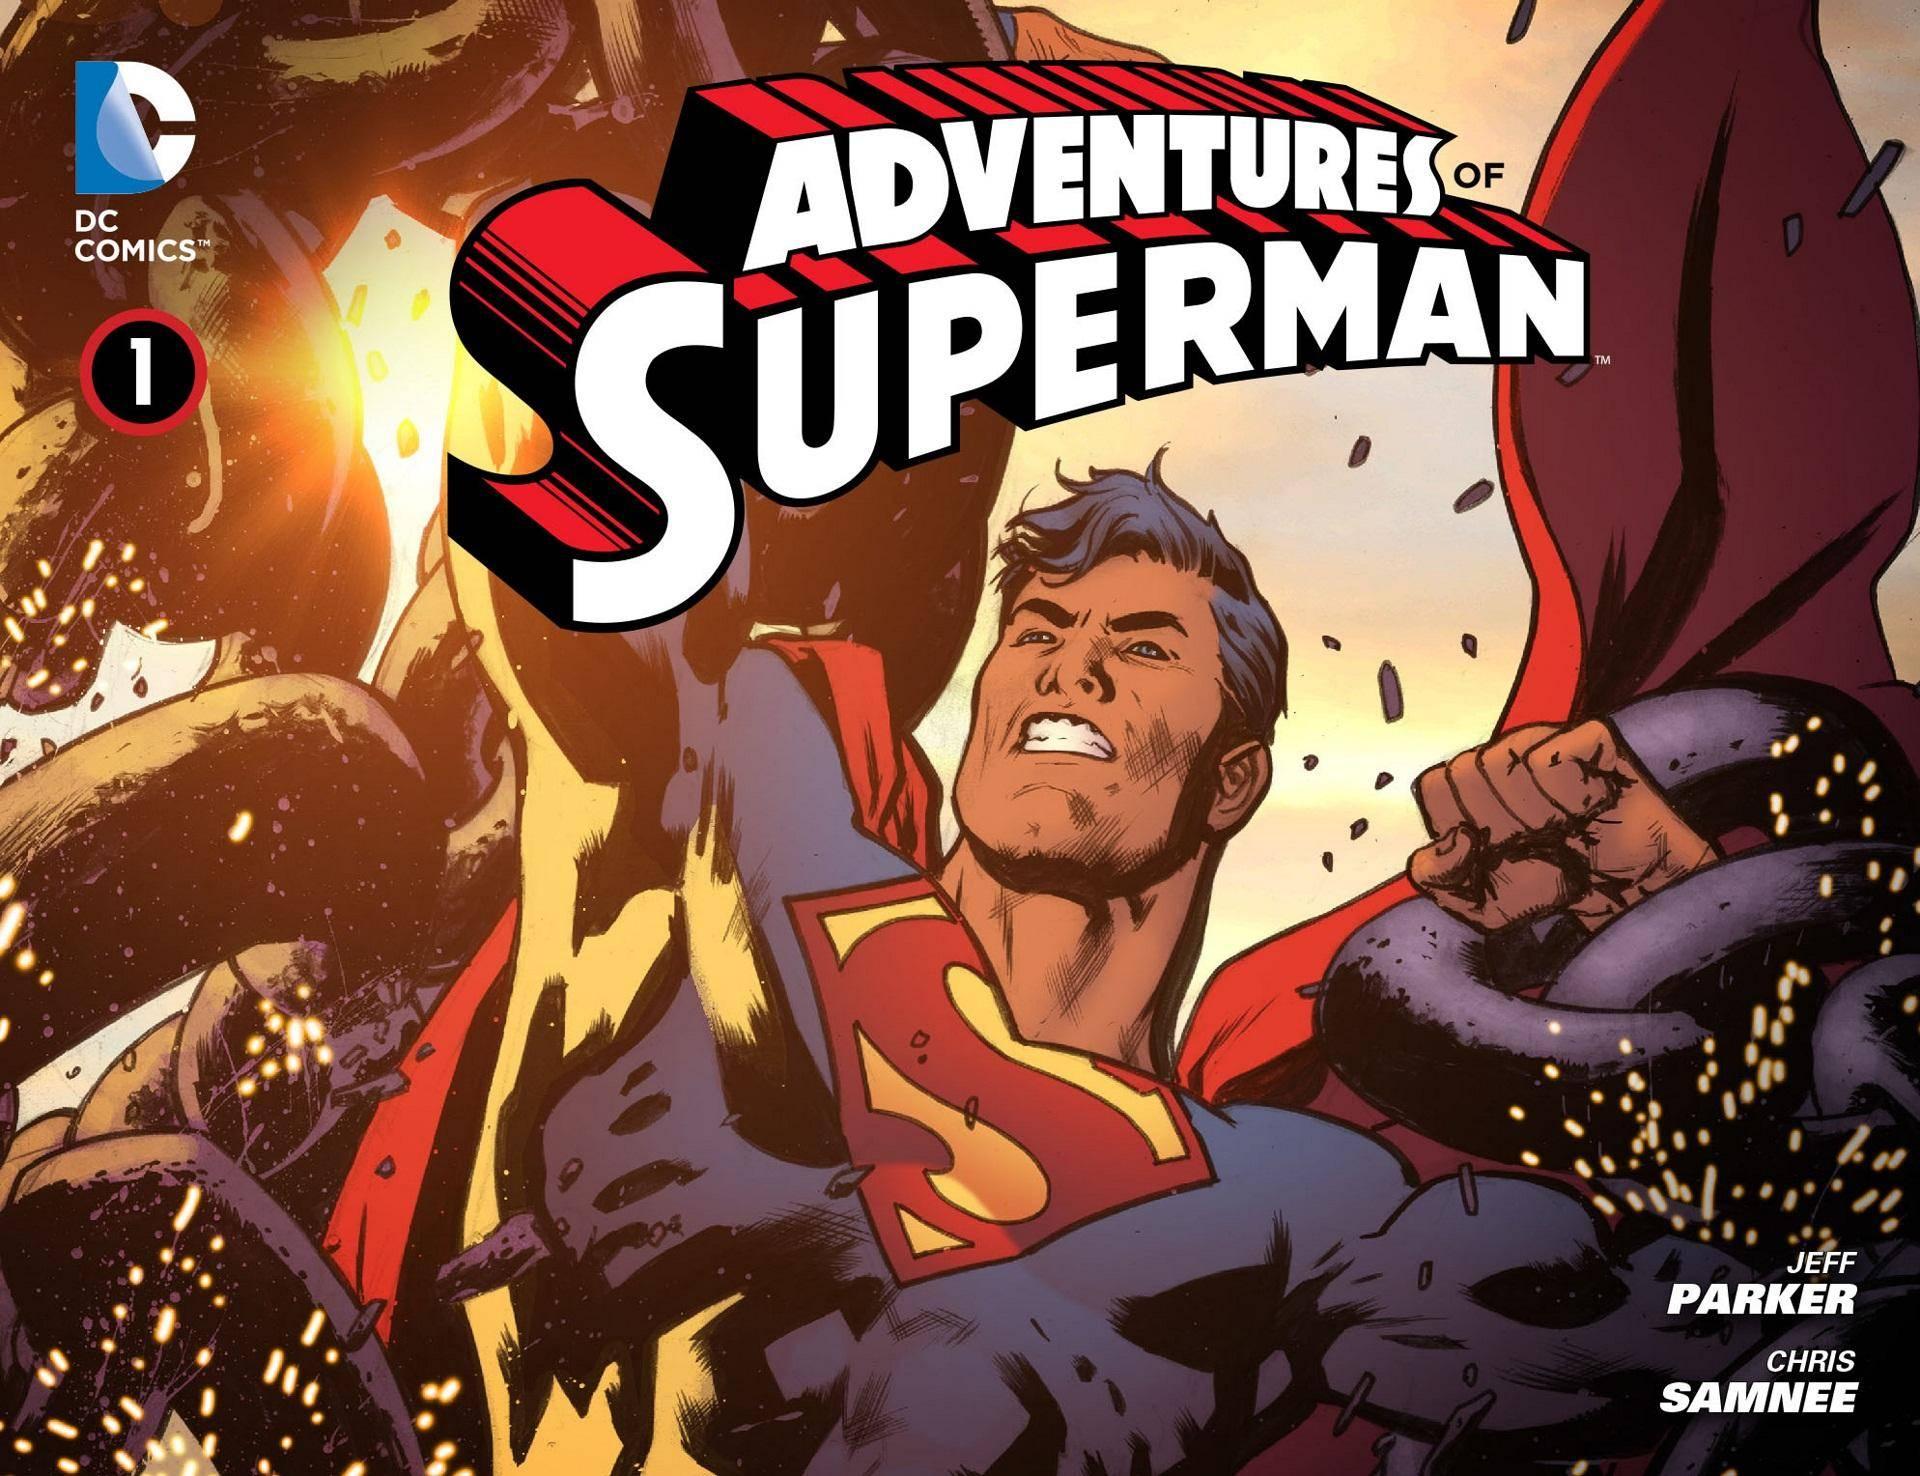 Adventures of Superman 001 2013 Digital